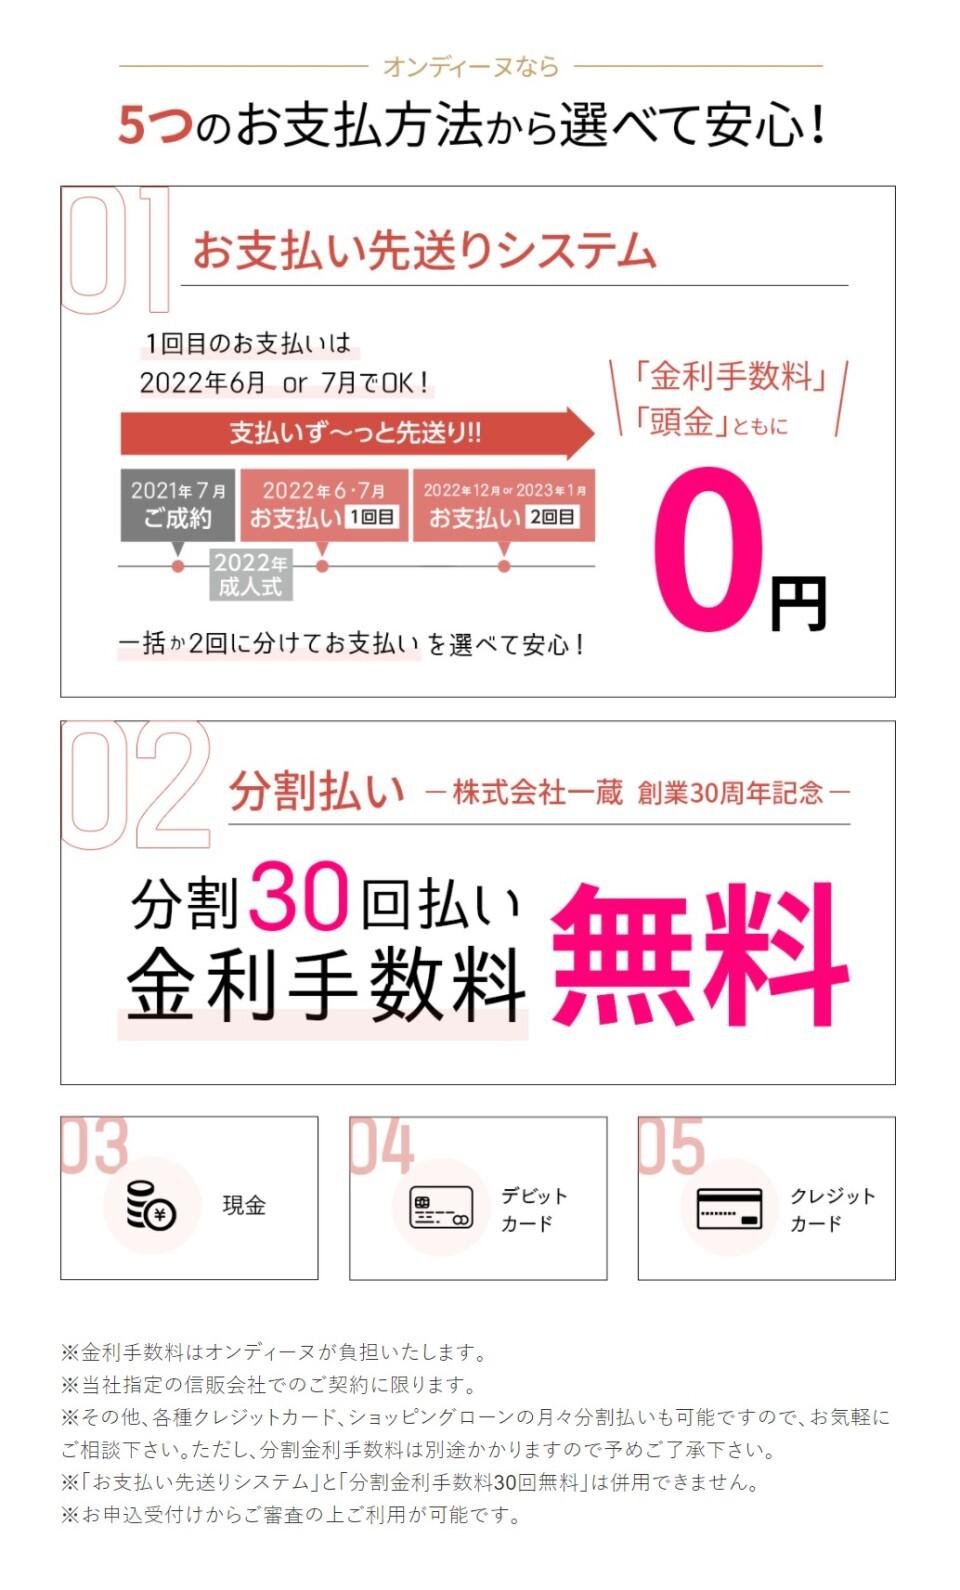 FireShot Capture 6270 - オンディーヌ各店周年祭|成人式の振袖レンタル・販売オンディーヌ - www.ondine.jp